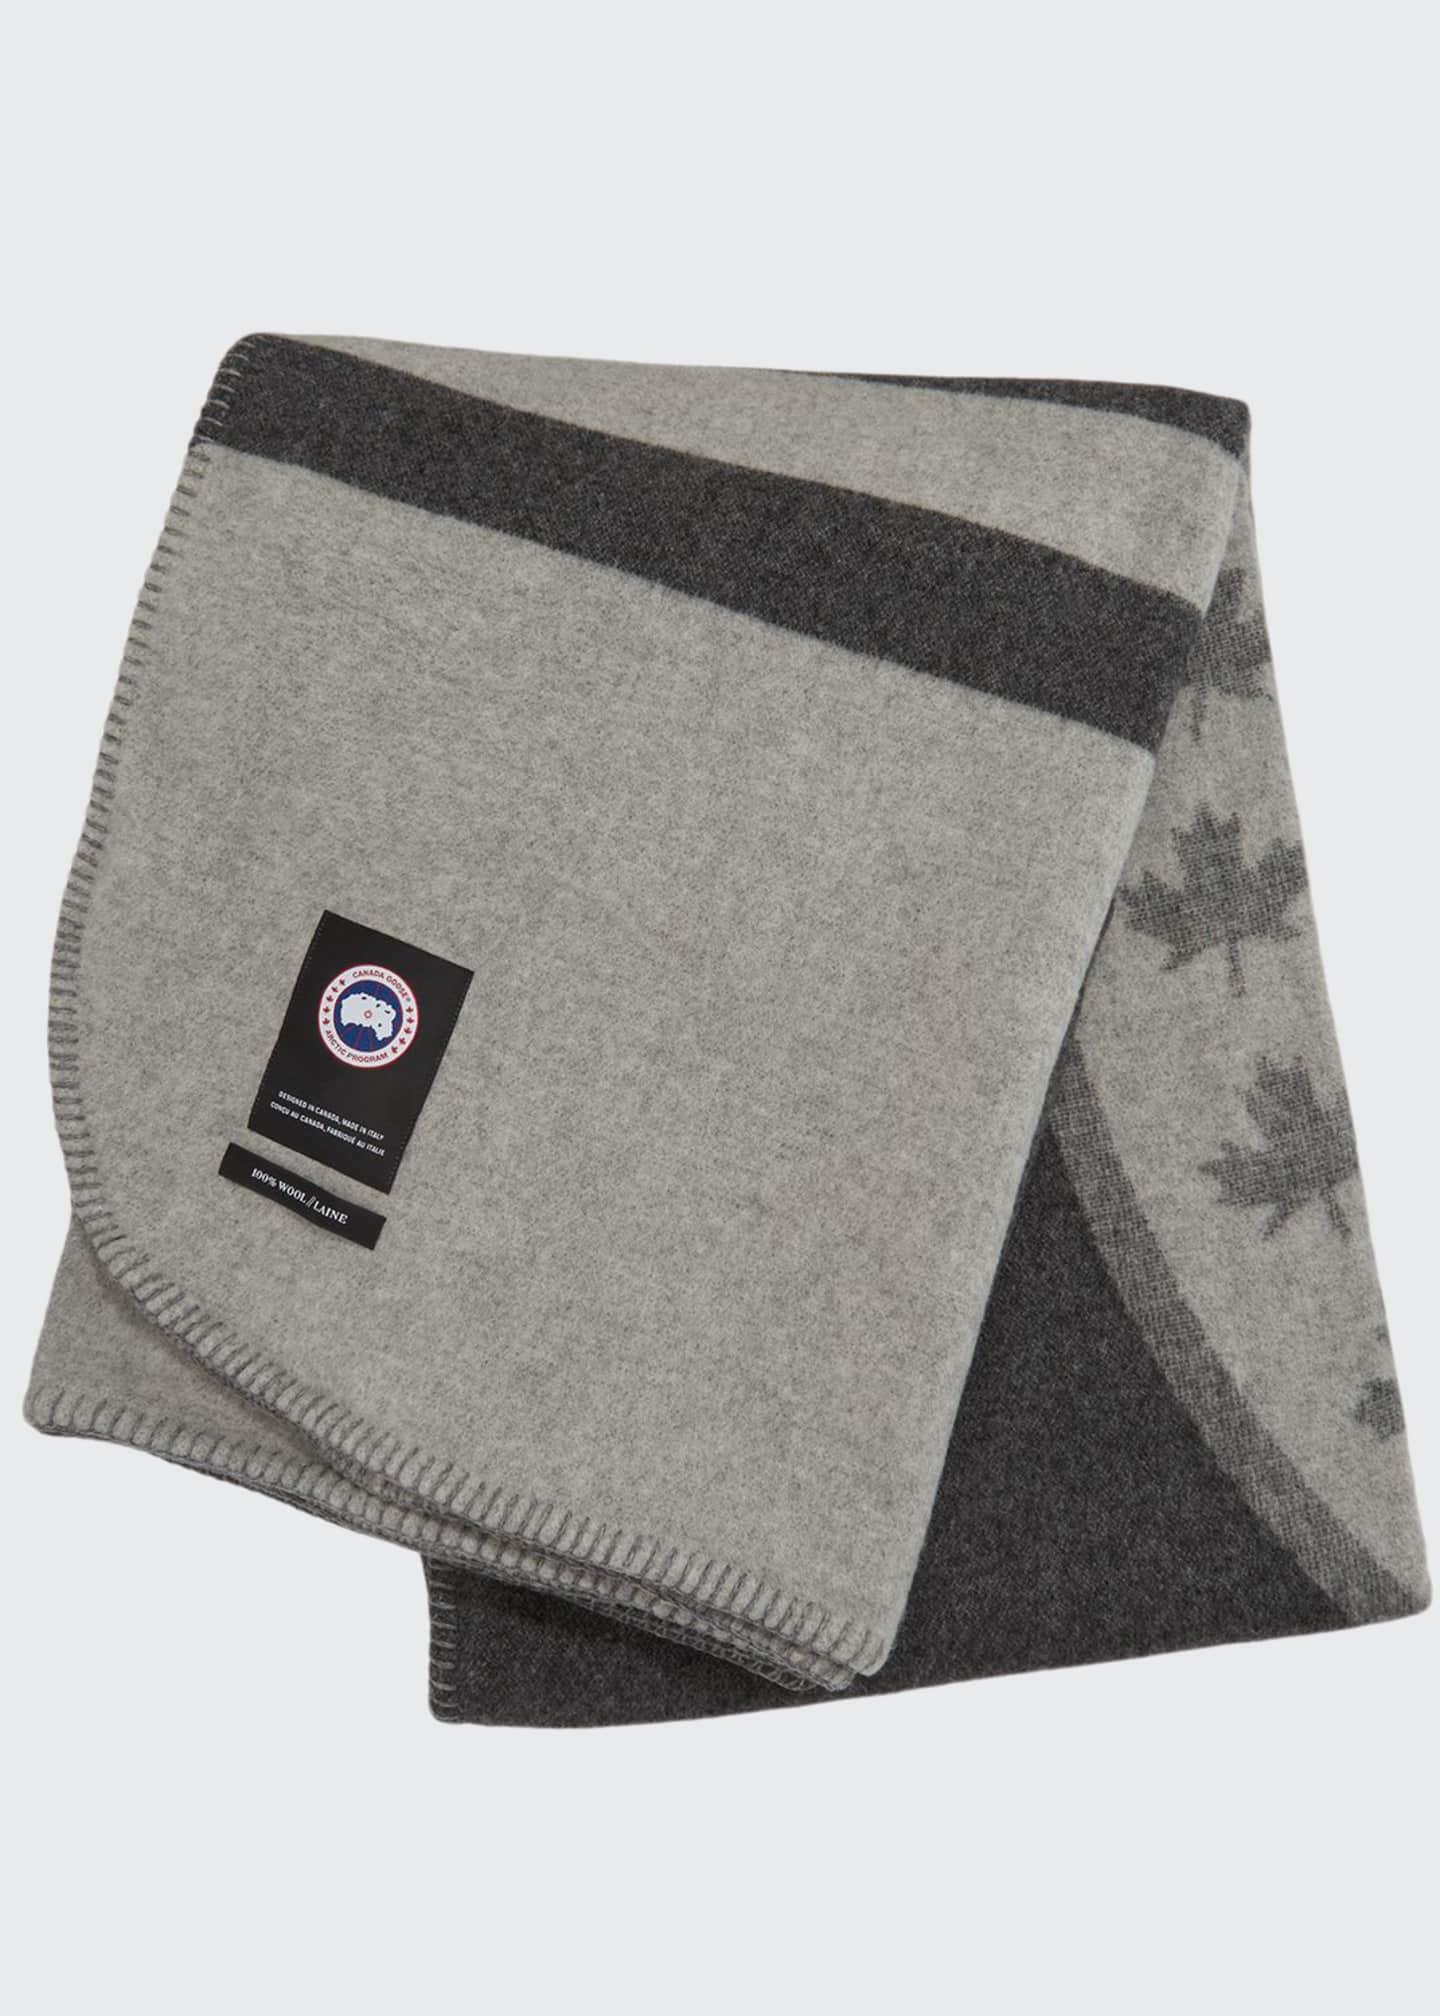 Canada Goose Men's Heavyweight Merino Wool Blanket